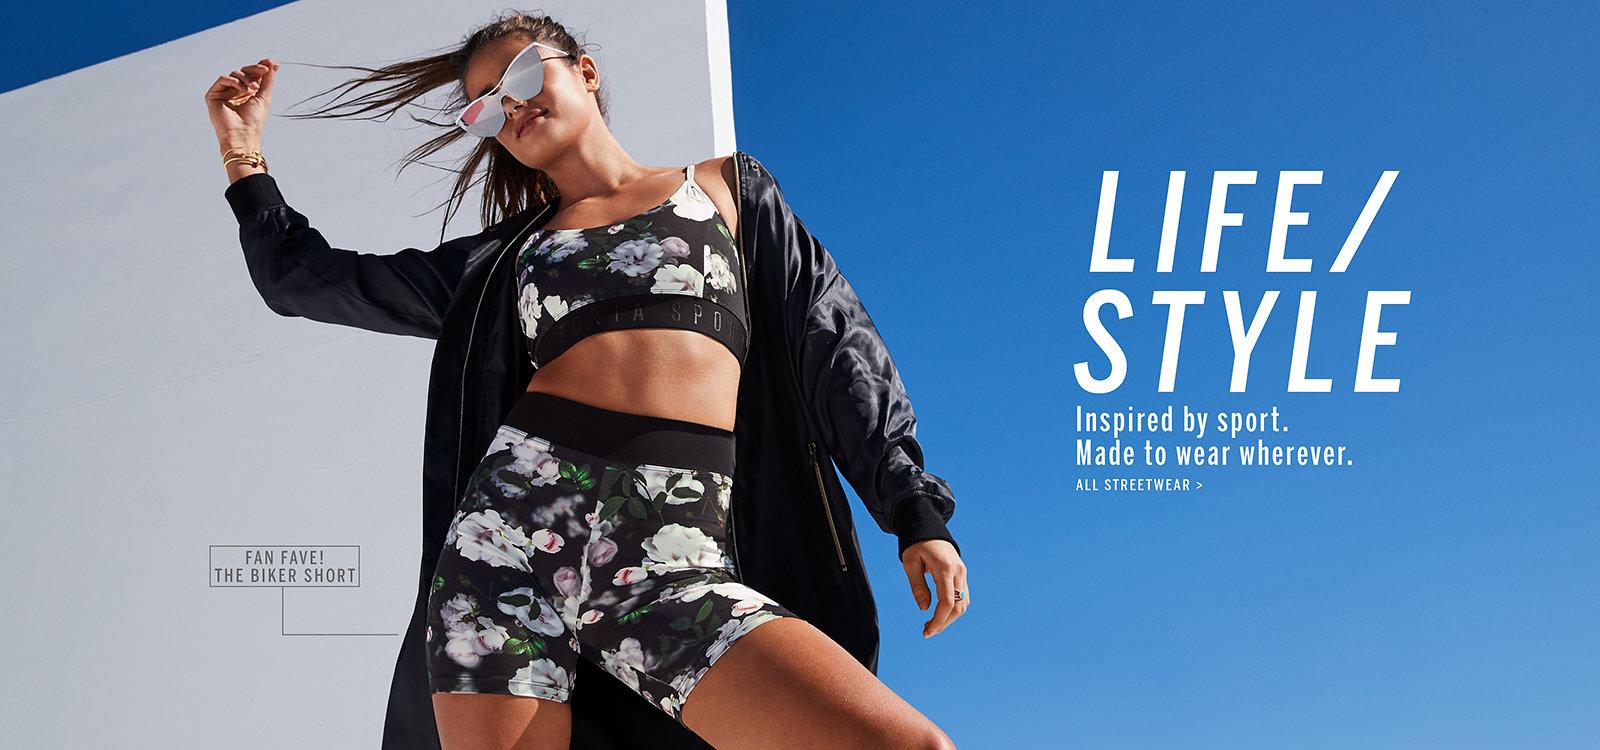 23-030719-sport-active-life-feat-streetwear-cue.jpg